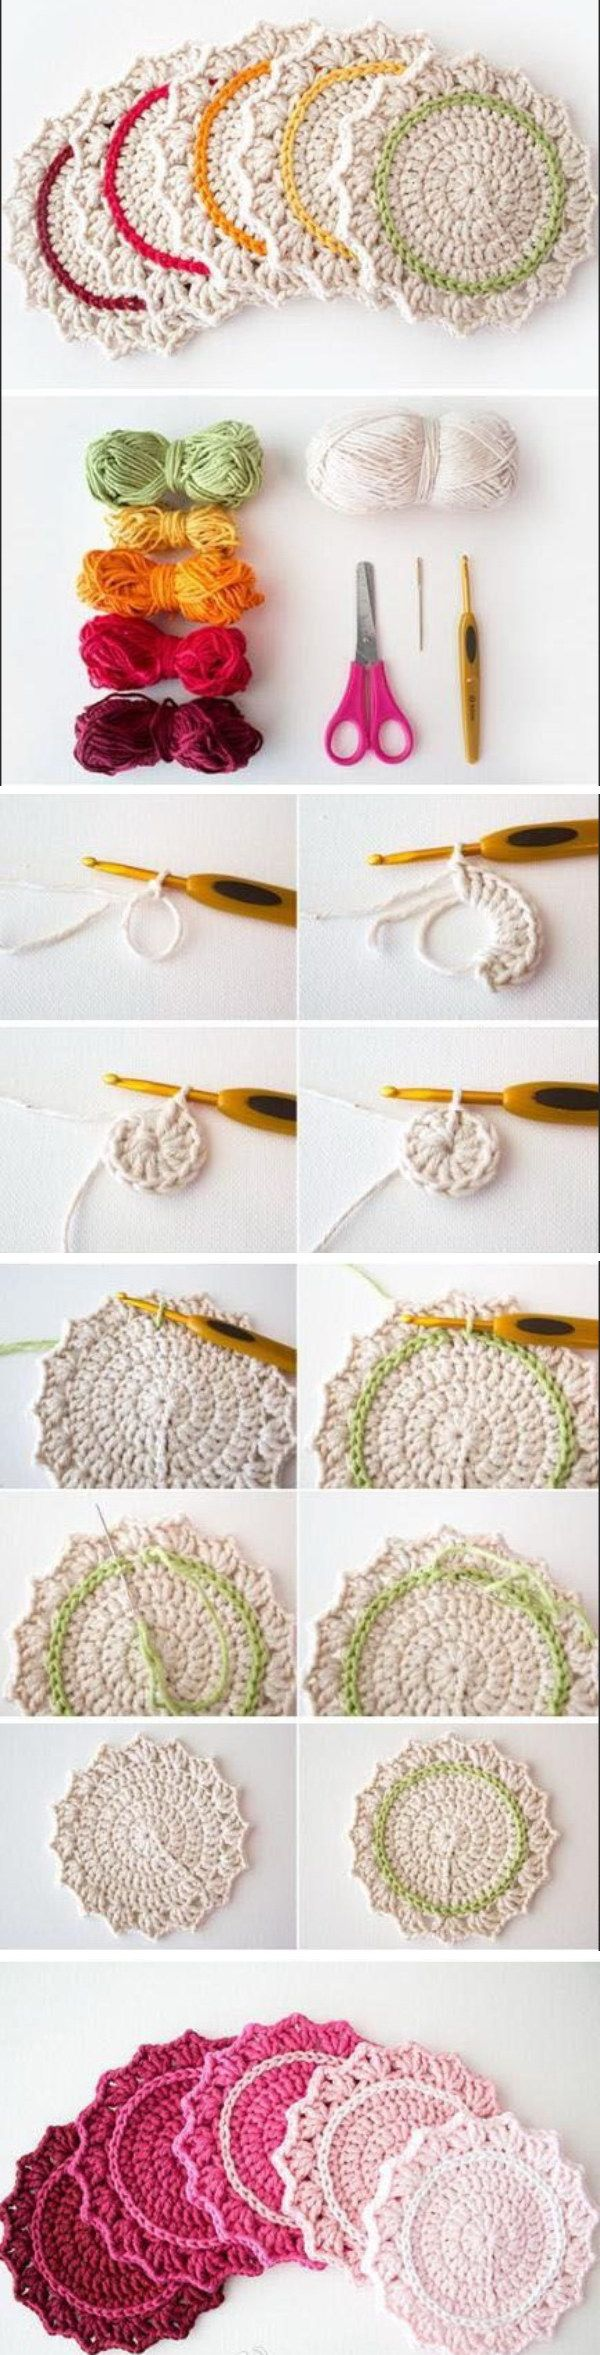 115 best crochet images on Pinterest | Crochet doll clothes ...